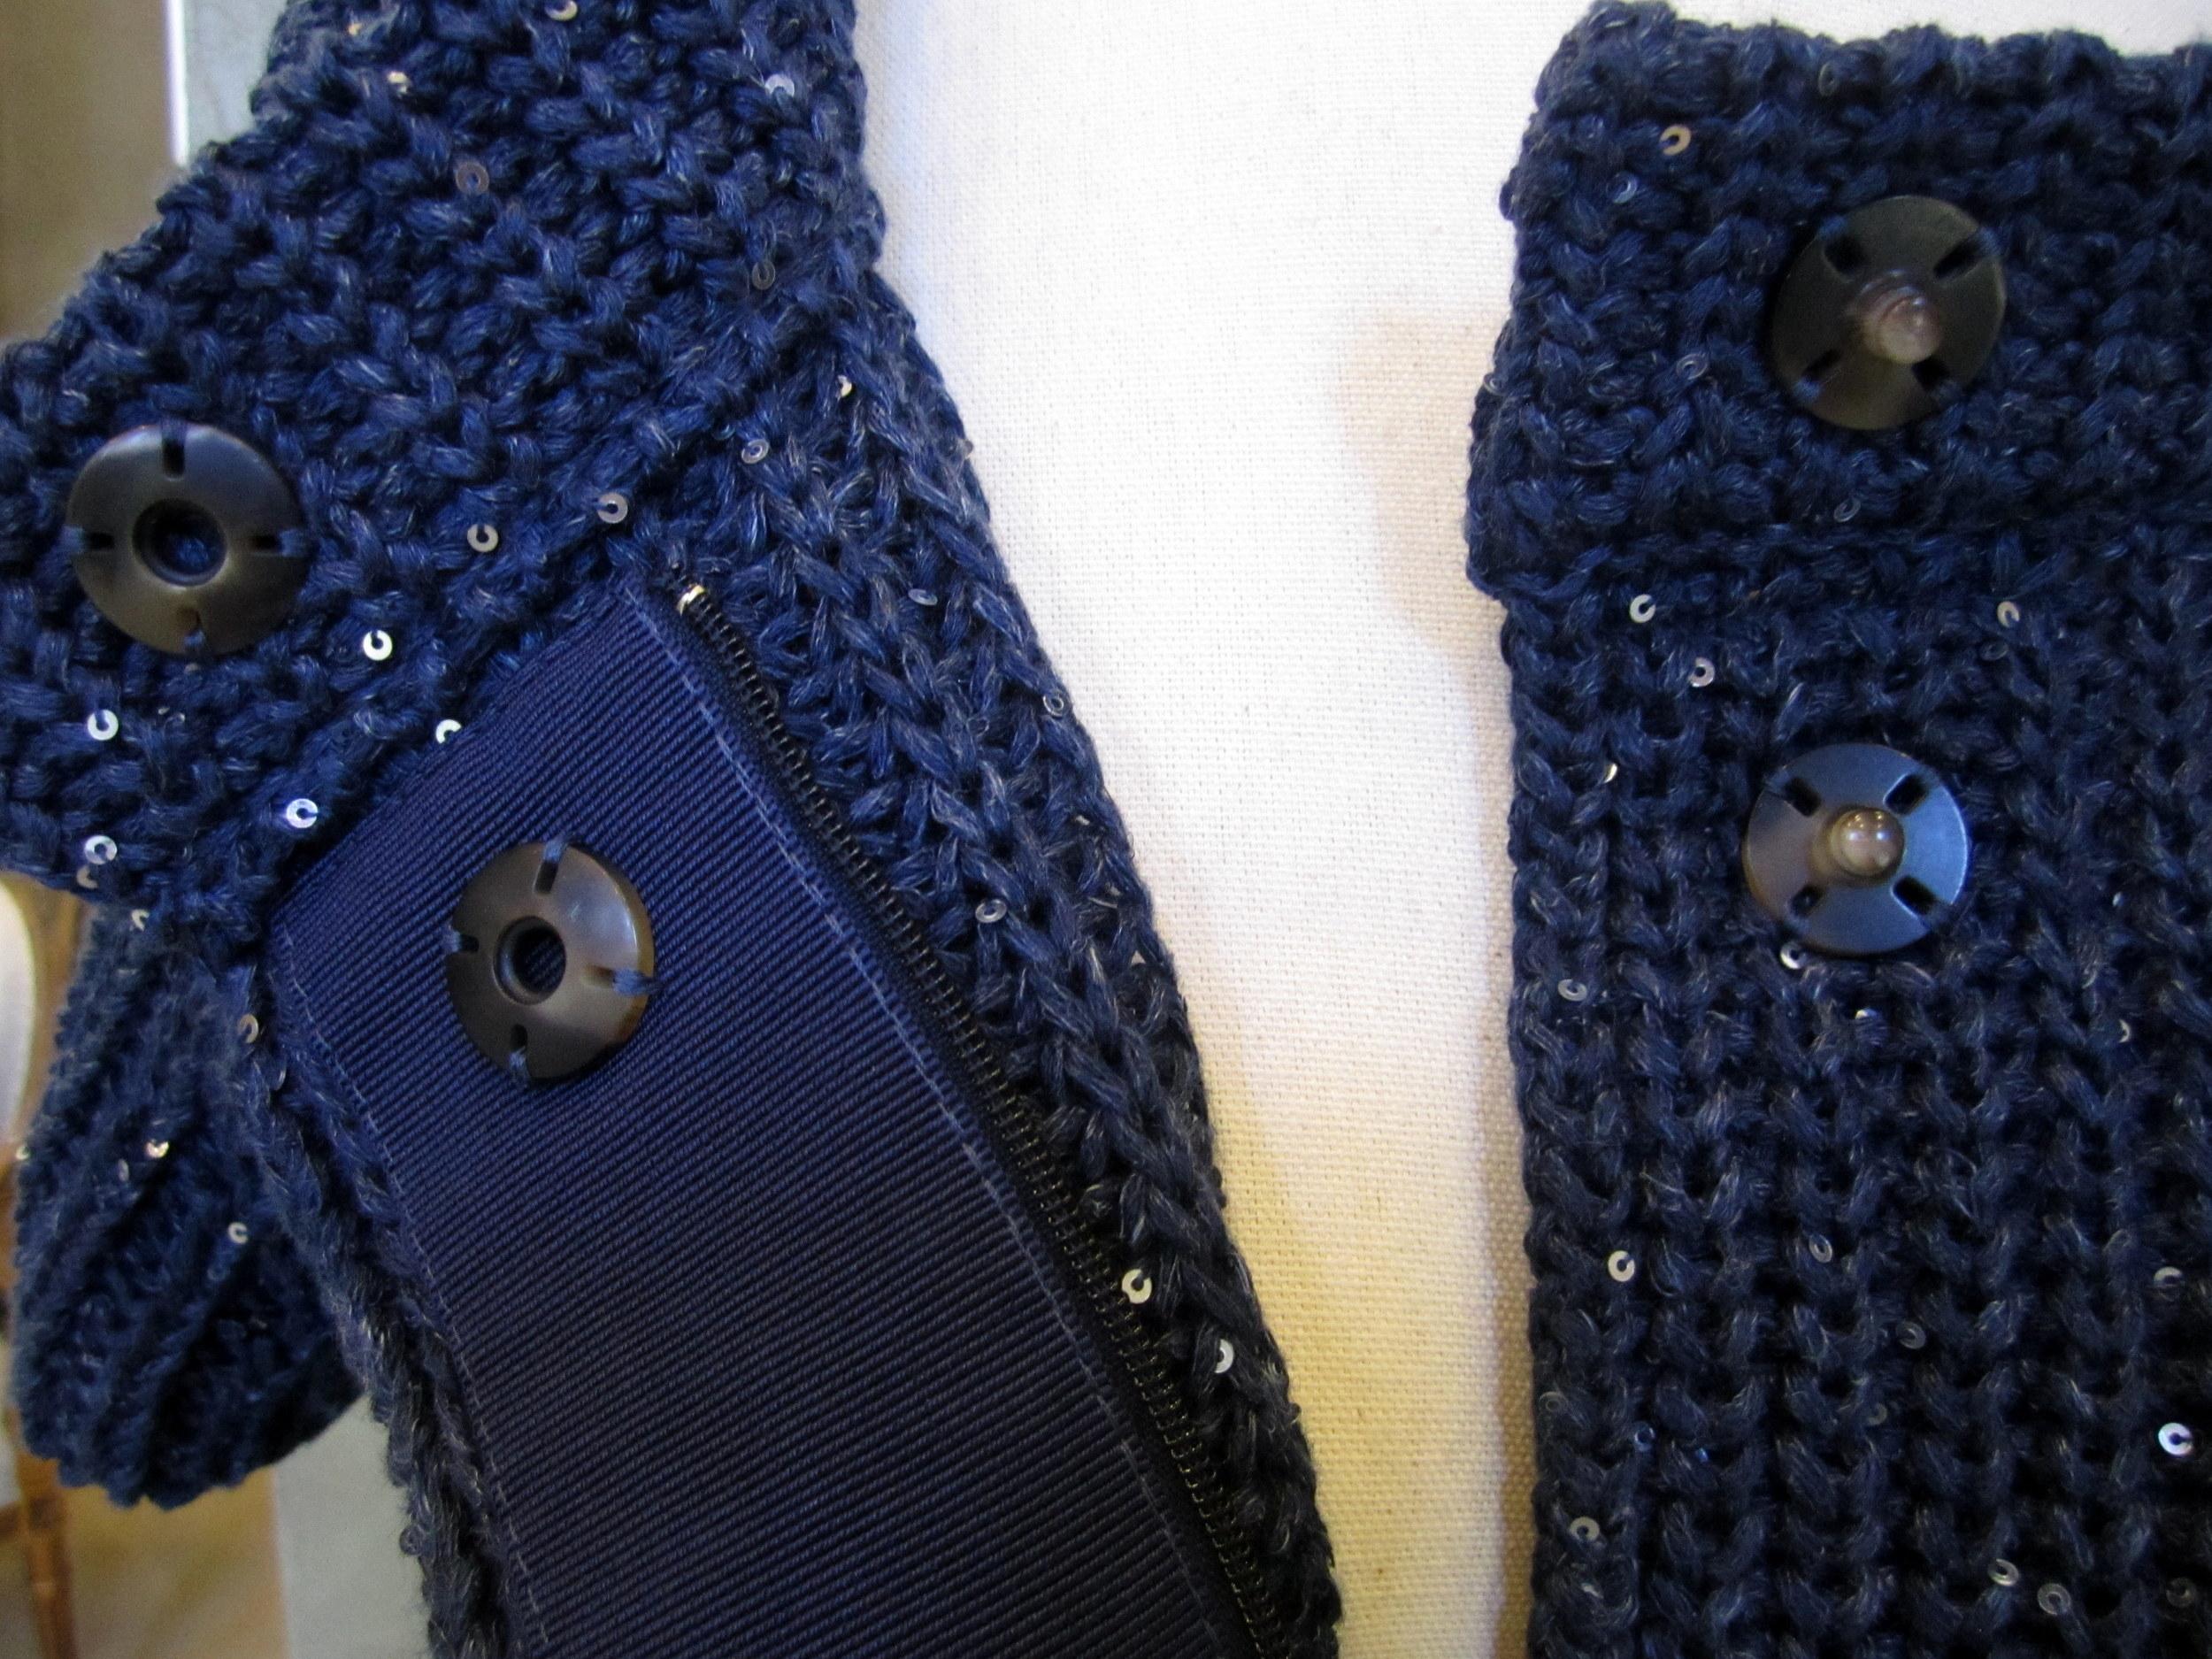 Herno Cotton / Linen Sweater Detail.